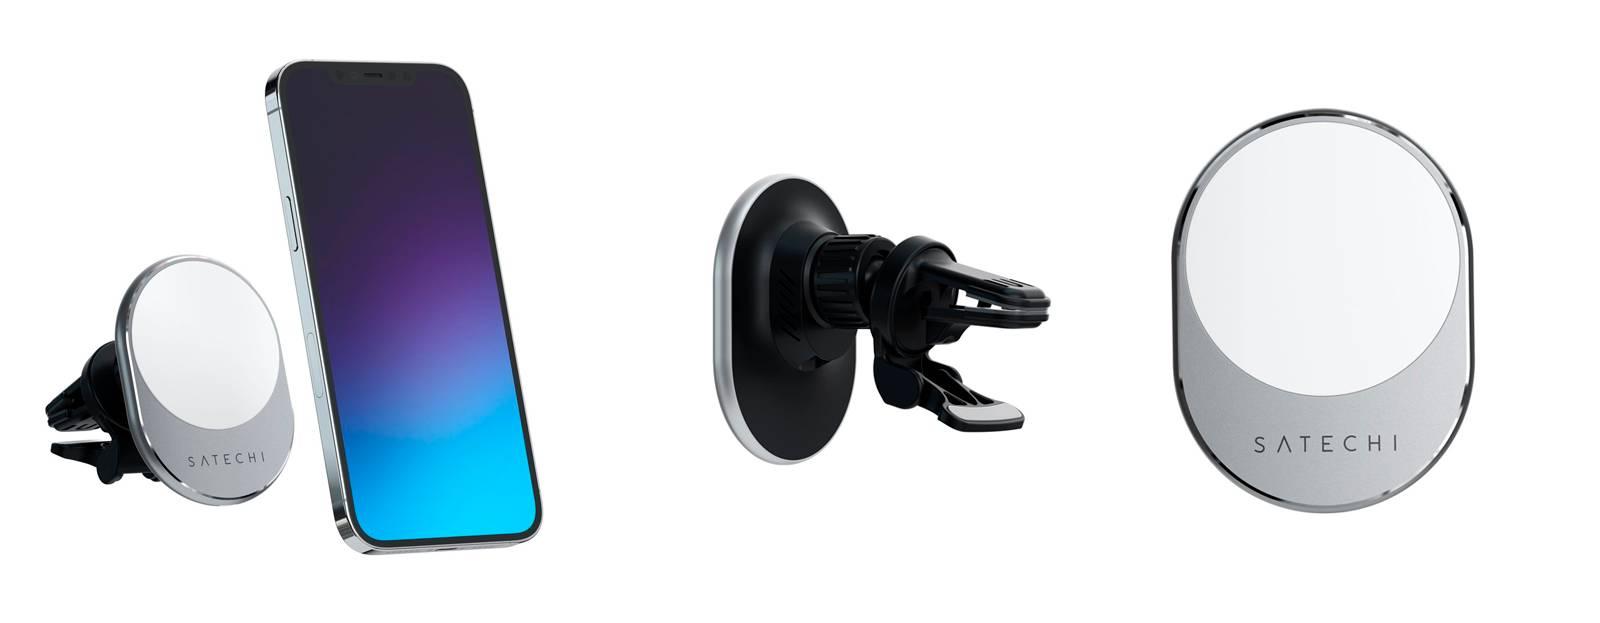 Беспроводная зарядка для автомобиля Satechi Magnetic Wireless Car Charger